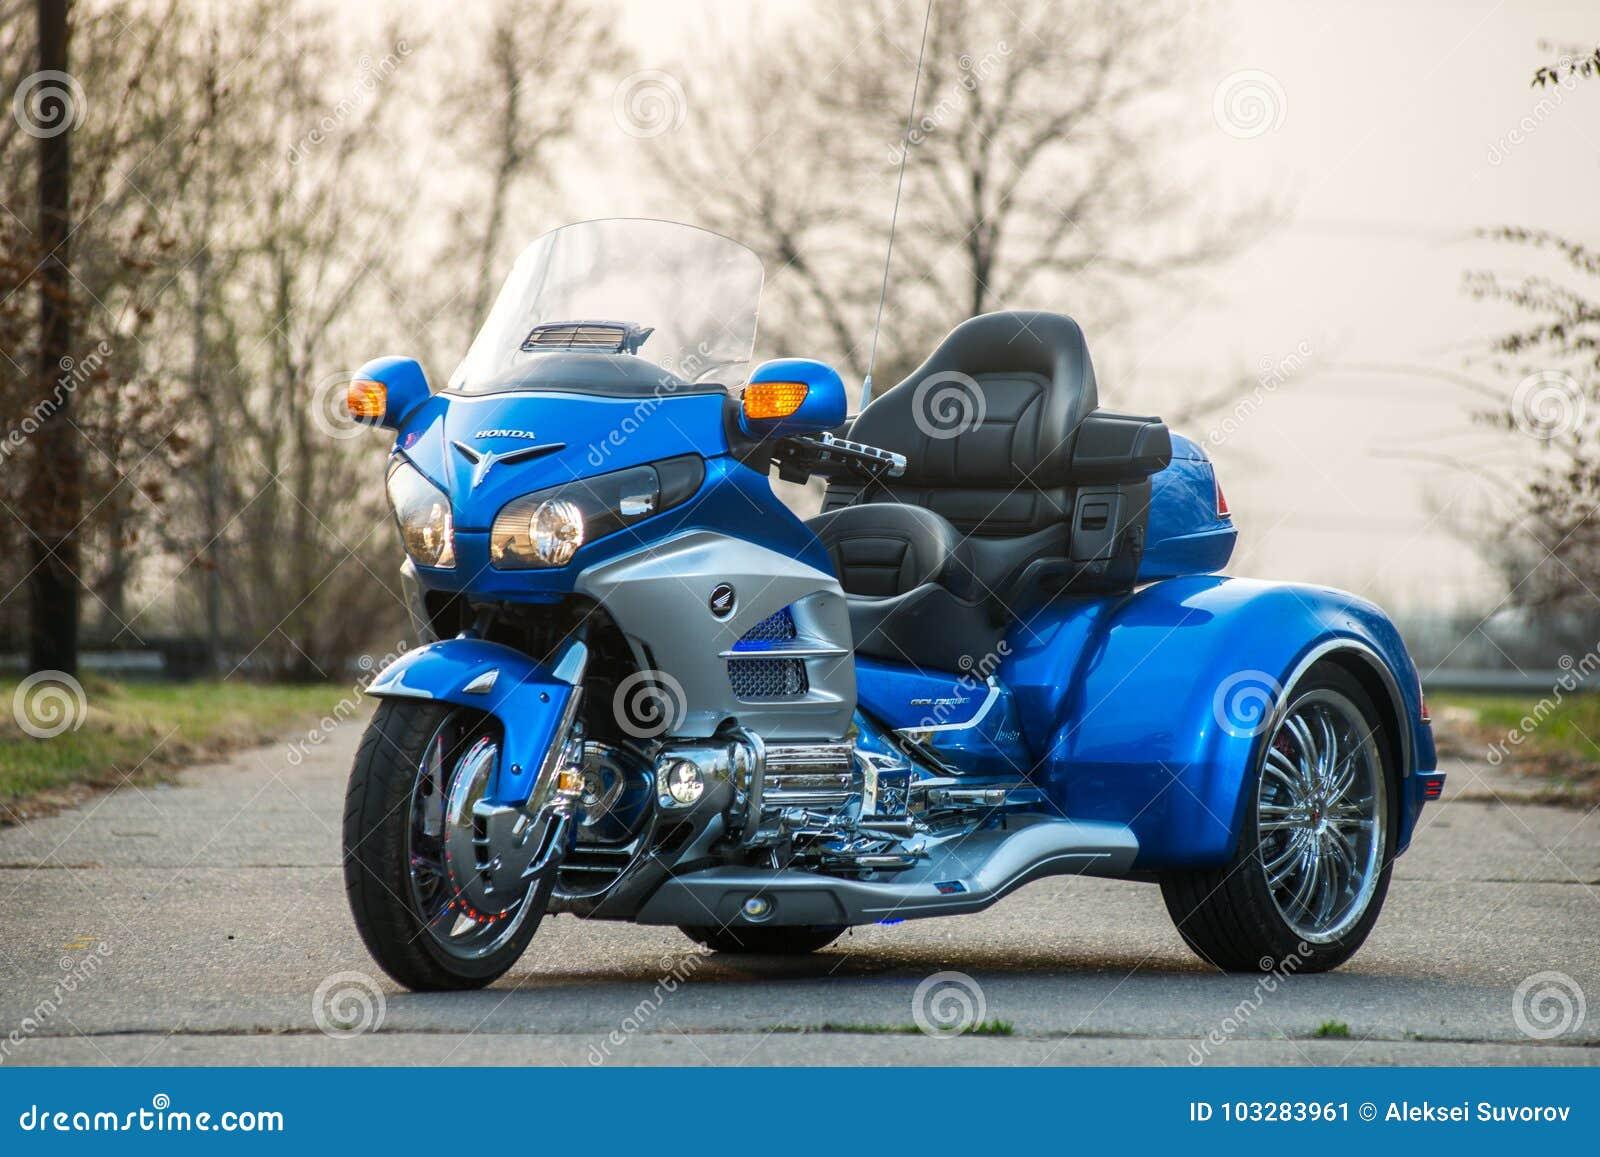 khabarovsk russie 3 mai 2017 la motocyclette trois roues de honda trake main assembl e se. Black Bedroom Furniture Sets. Home Design Ideas